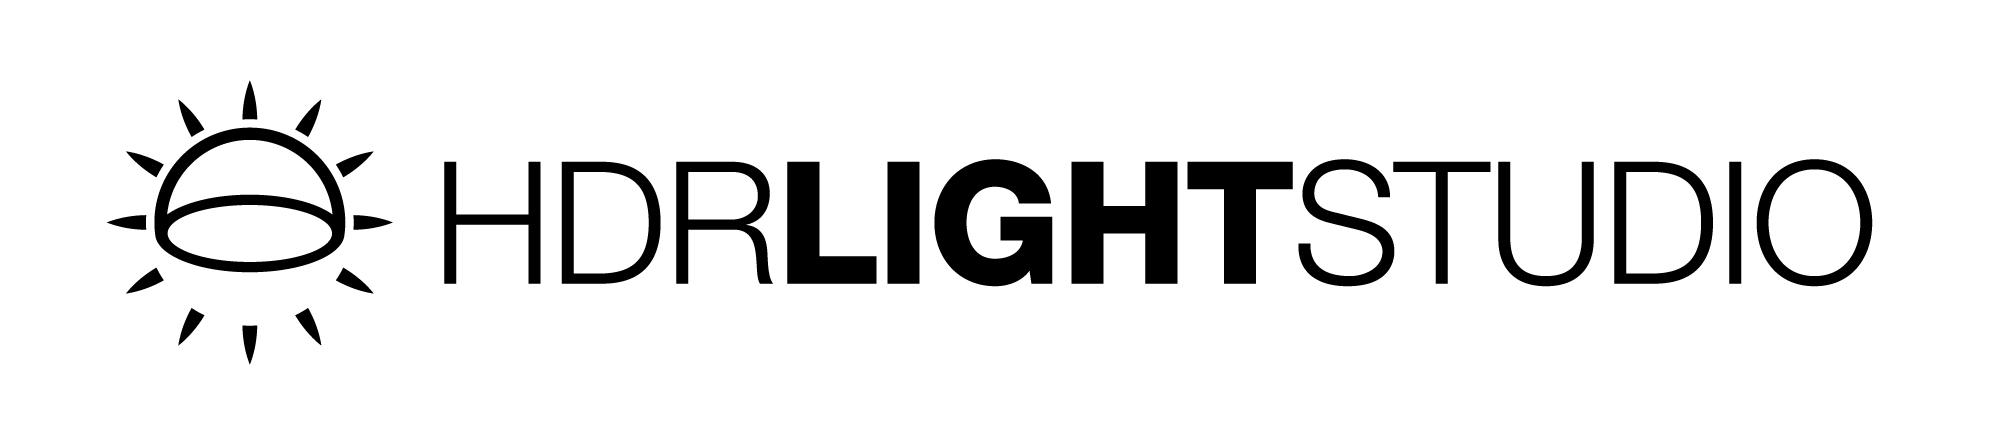 Lightmap HDR Light Studio 5.4.2 نرم افزار اضافه کردن HDR به تصاویر